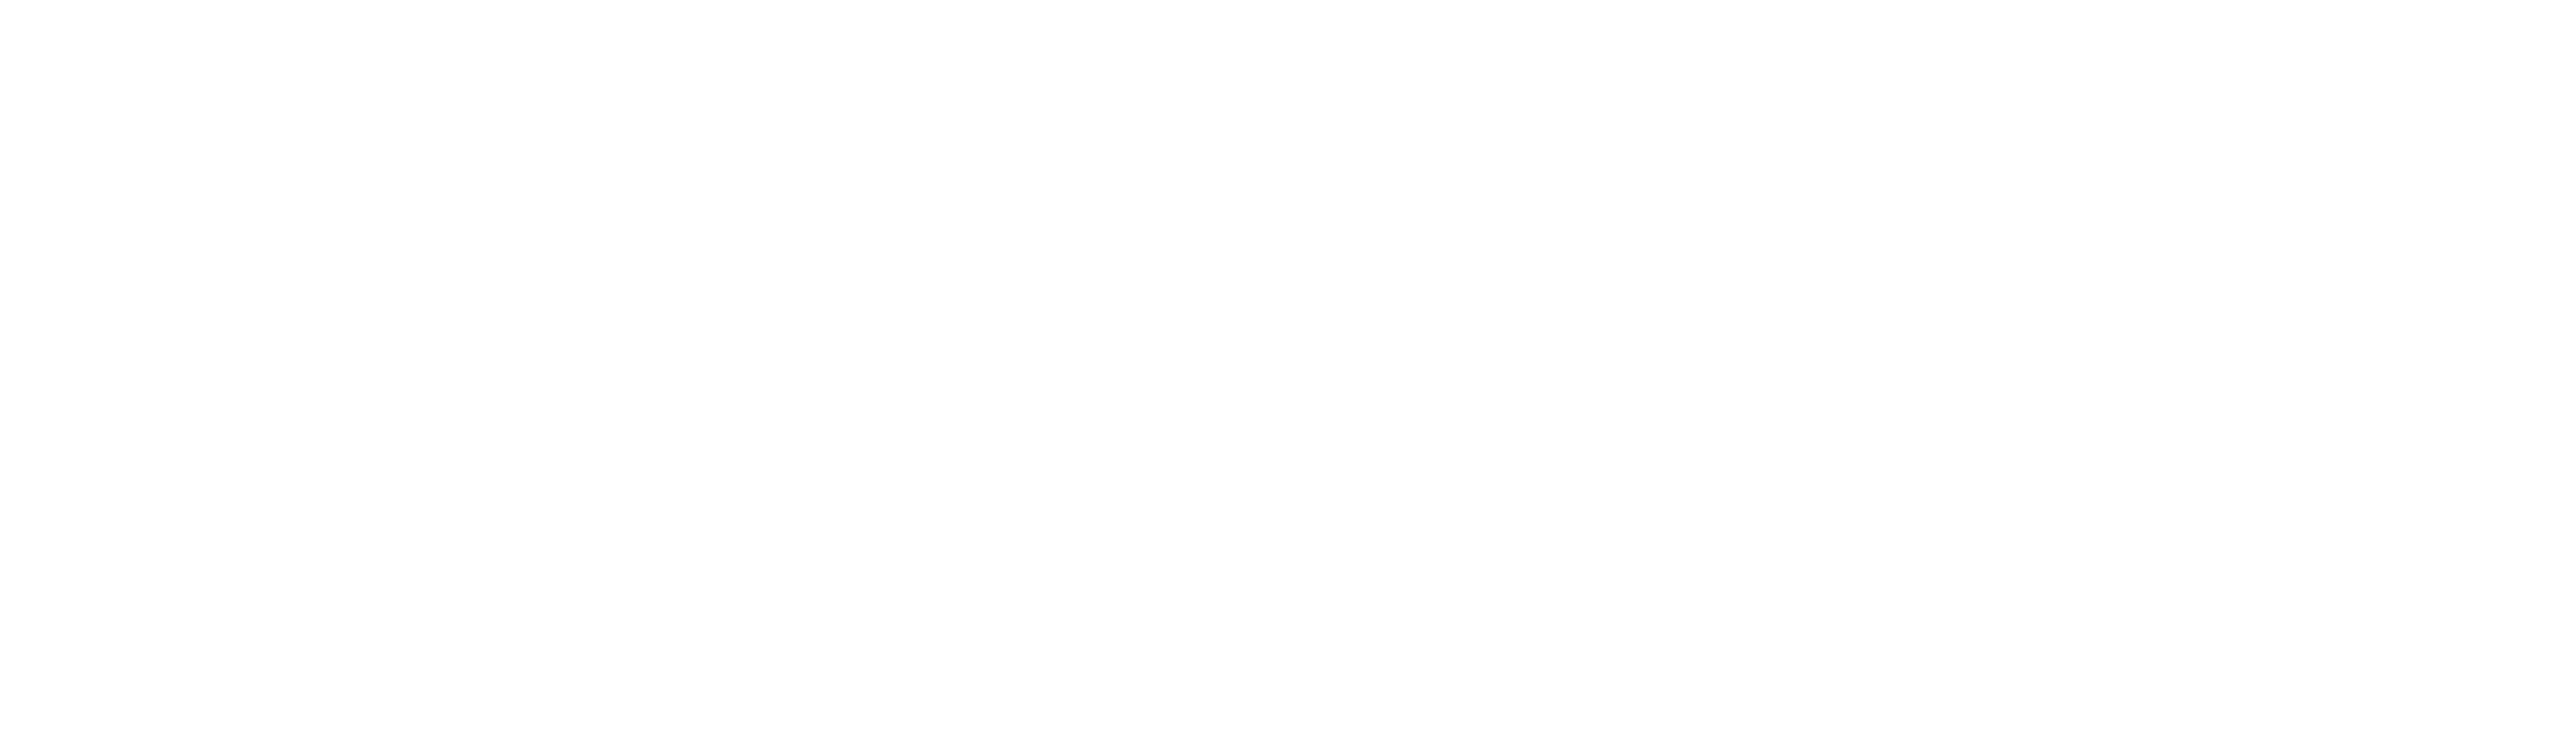 whiteOpsLogoHorizWhite_v3-01.png